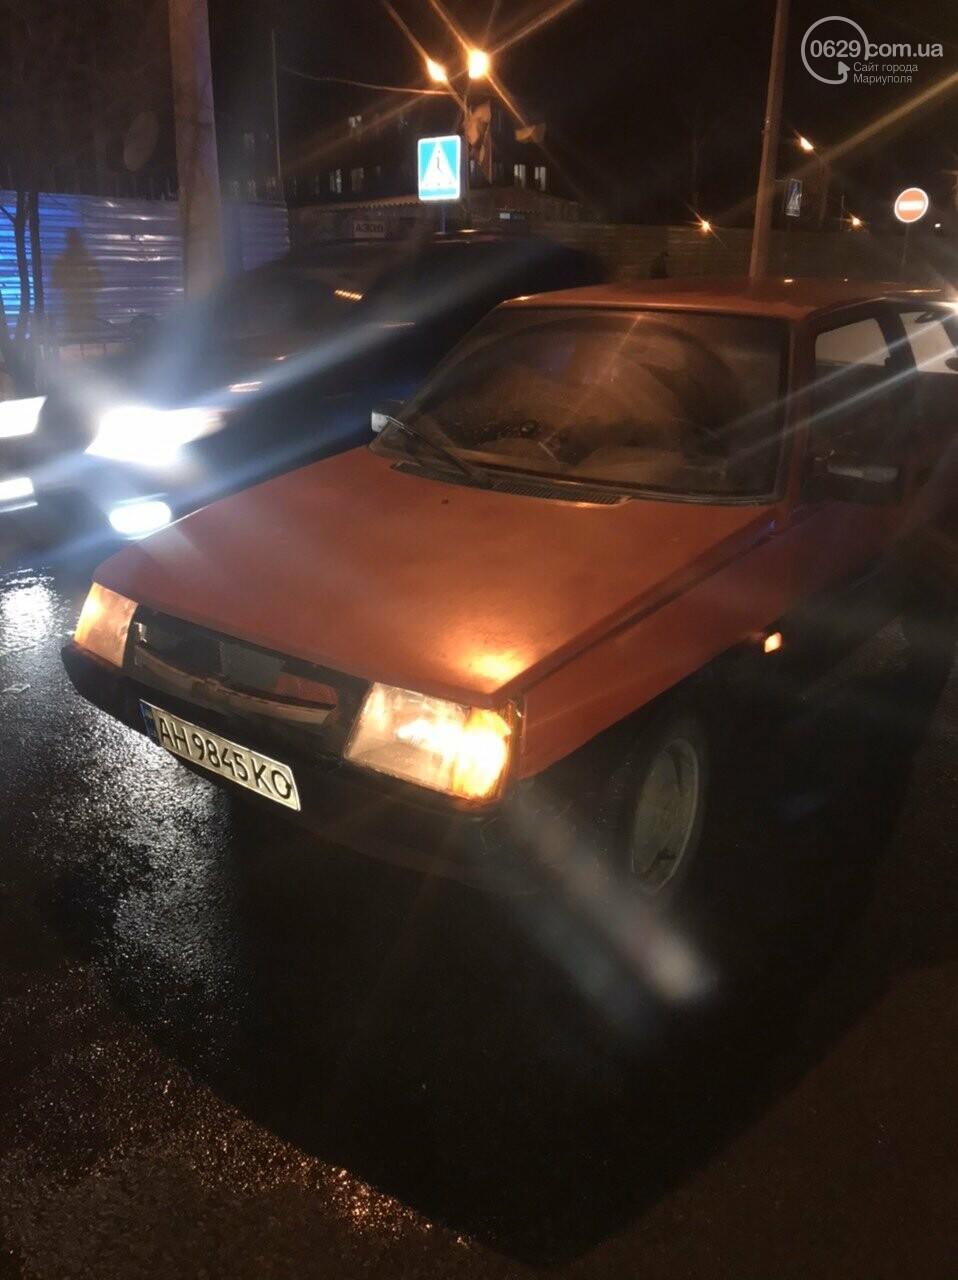 В Левобережном районе под колеса «Таврии» попала девушка, - ФОТО, фото-2